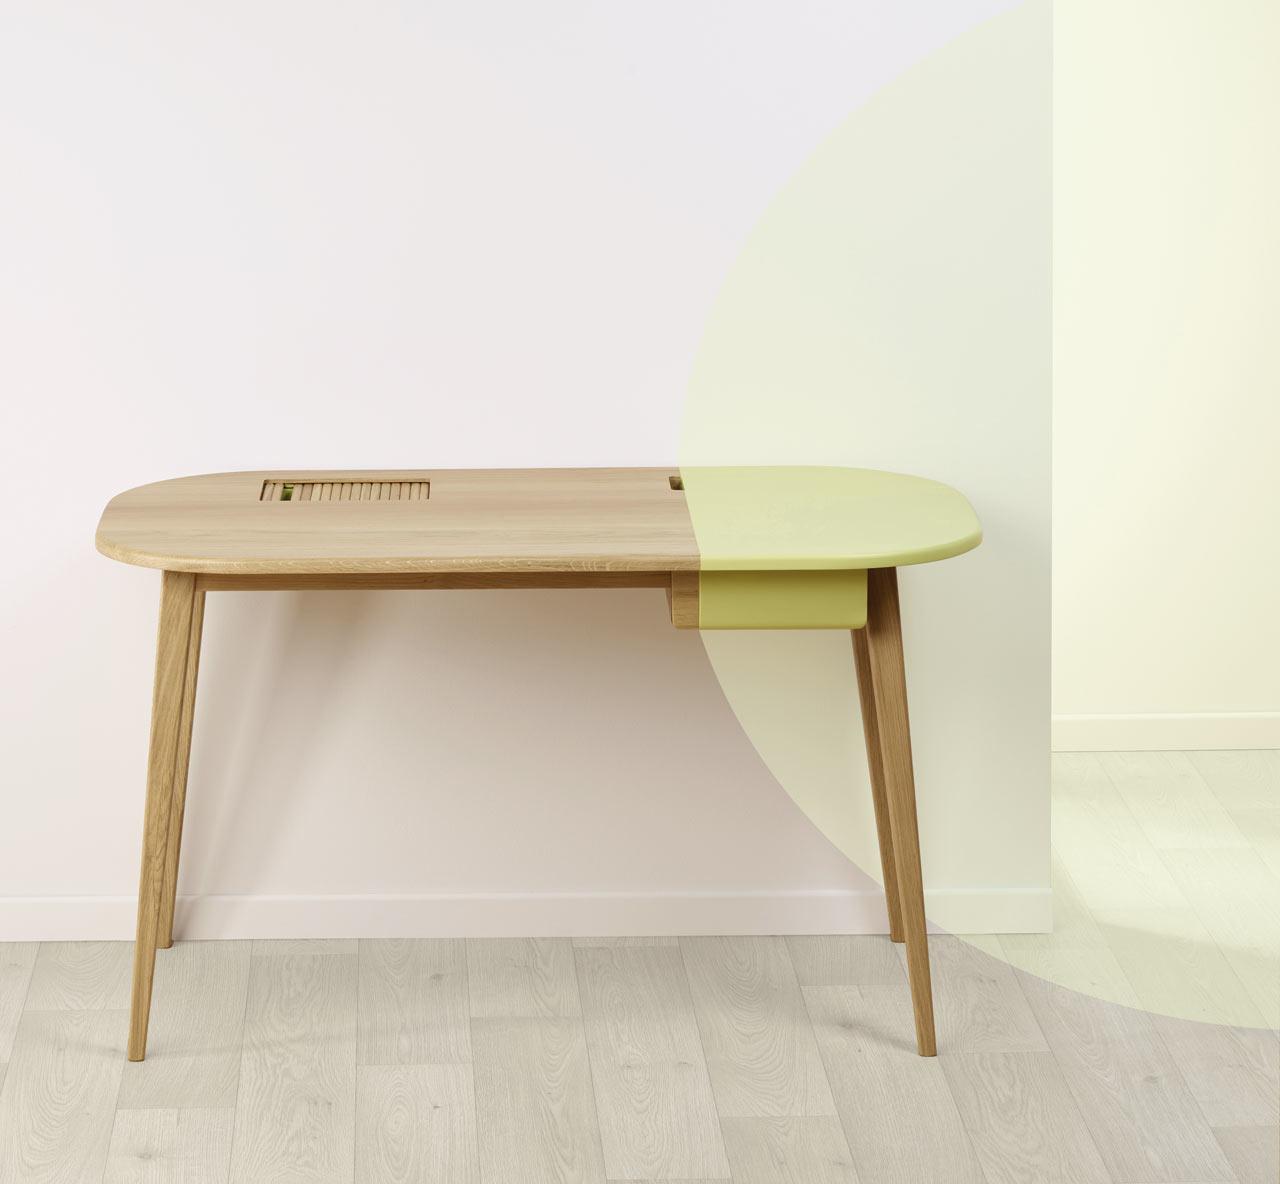 Julie-Gaillard-Latitude-Furniture-hisheji (9)